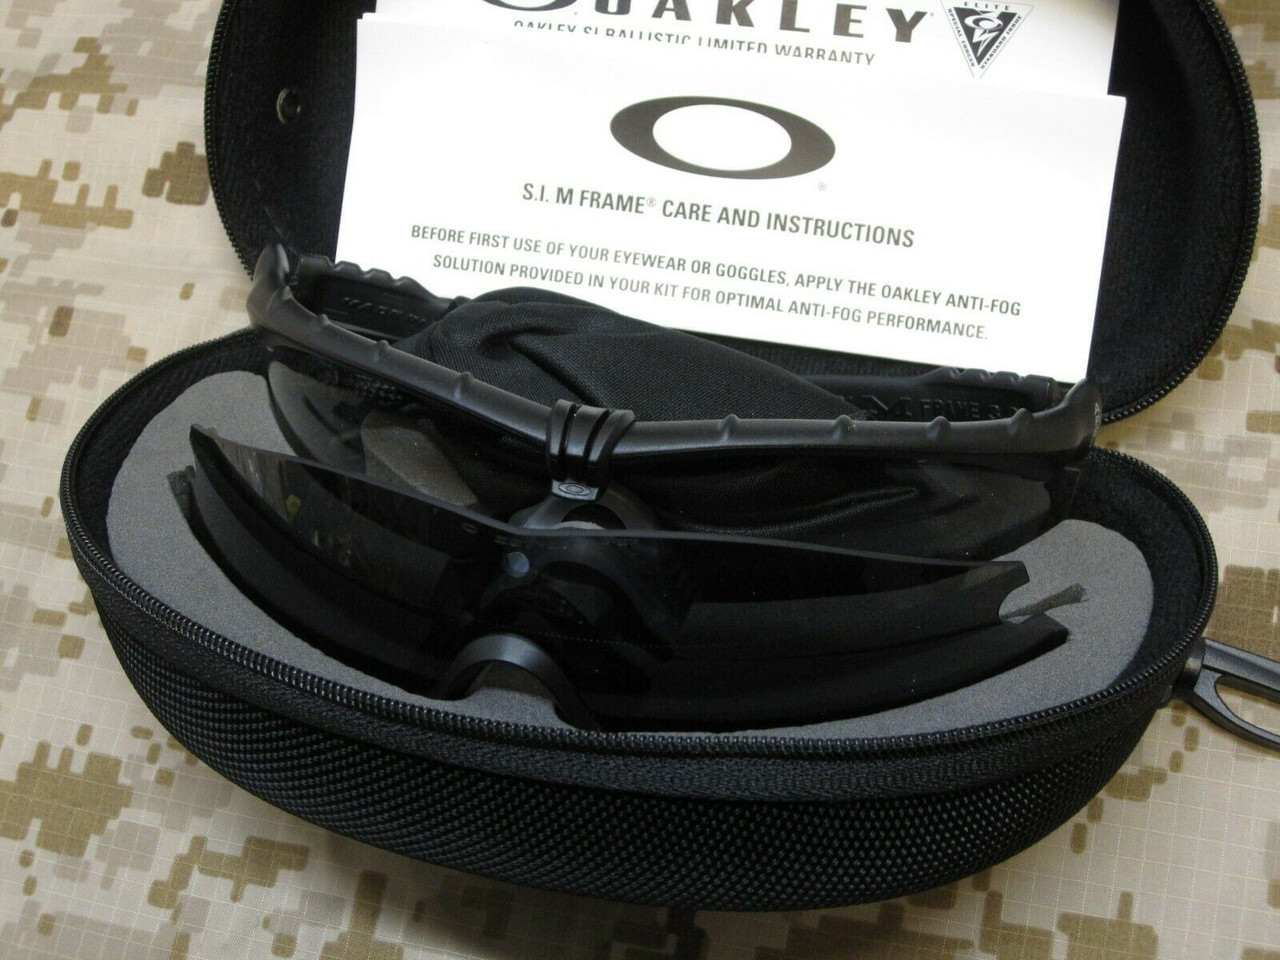 OAKLEY SI SHATTERPROOF M FRAME 3.0 CLEAR/DARK LENS MILITARY GLASSES STRIKE II